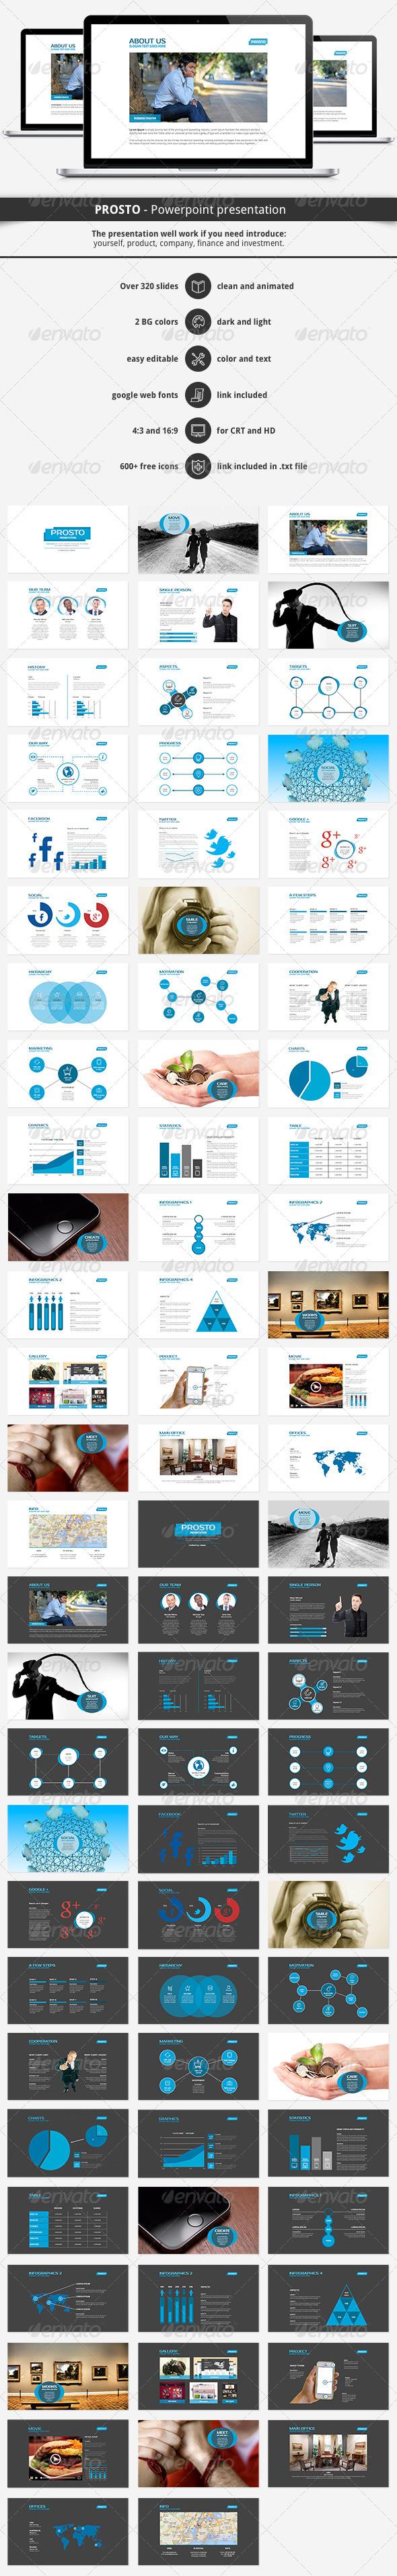 GraphicRiver PROSTO Powerpoint Presentation 6246775